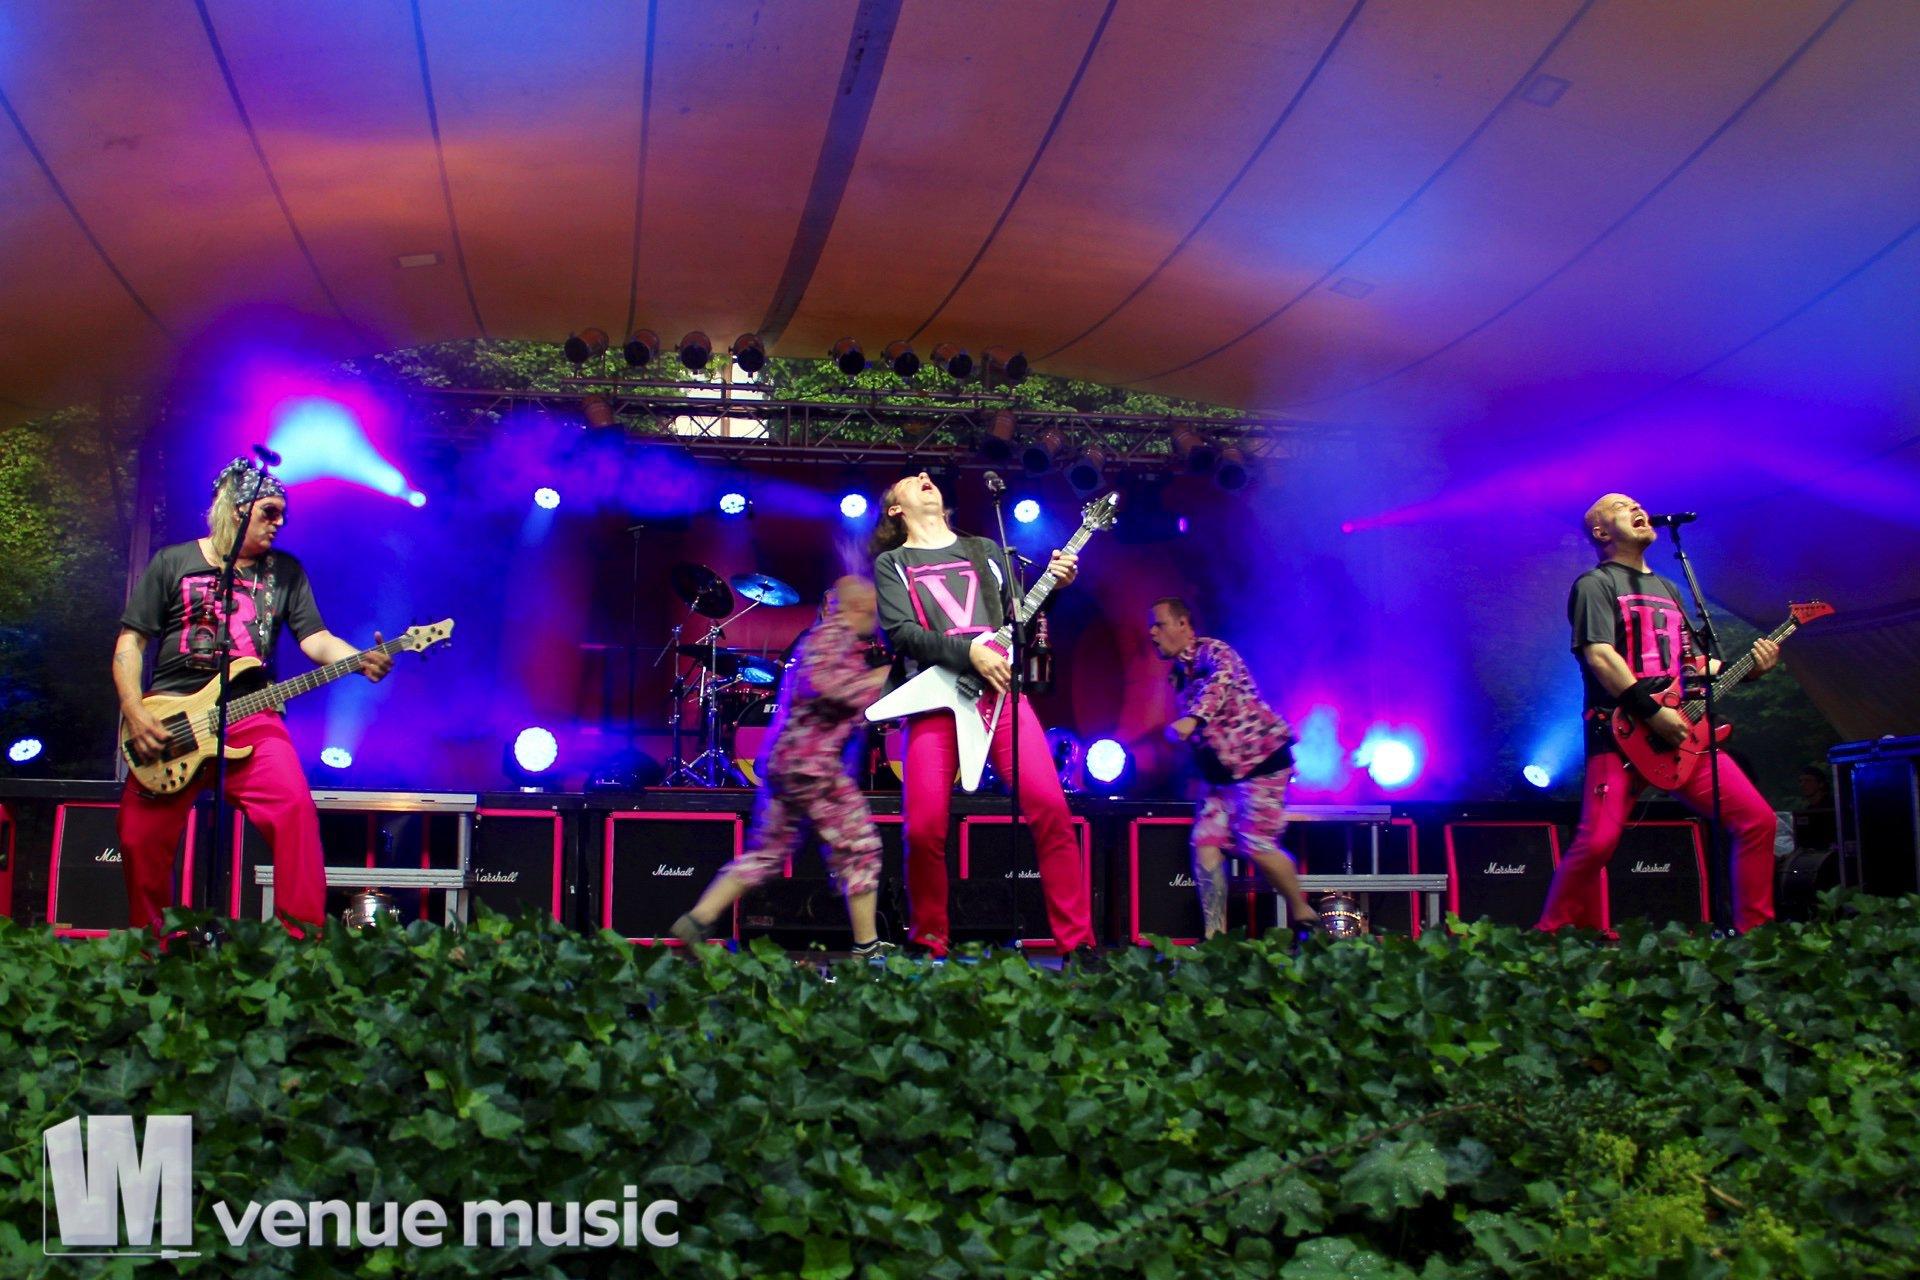 J.B.O.: 11.07.2016 Serenadenhof, Nürnberg